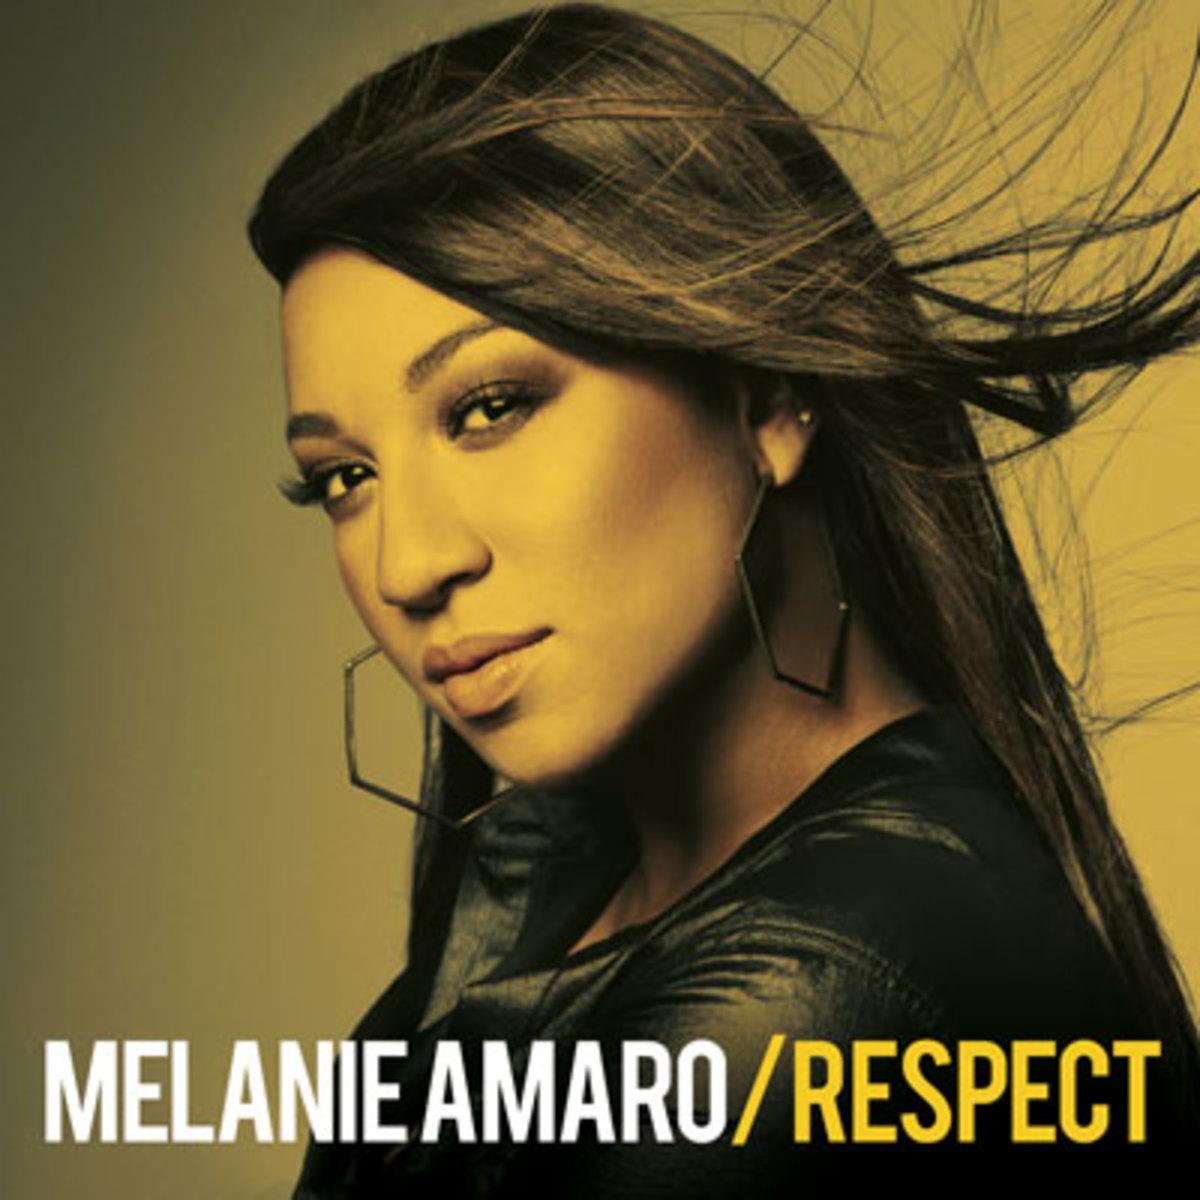 melanieamaro-respect.jpg